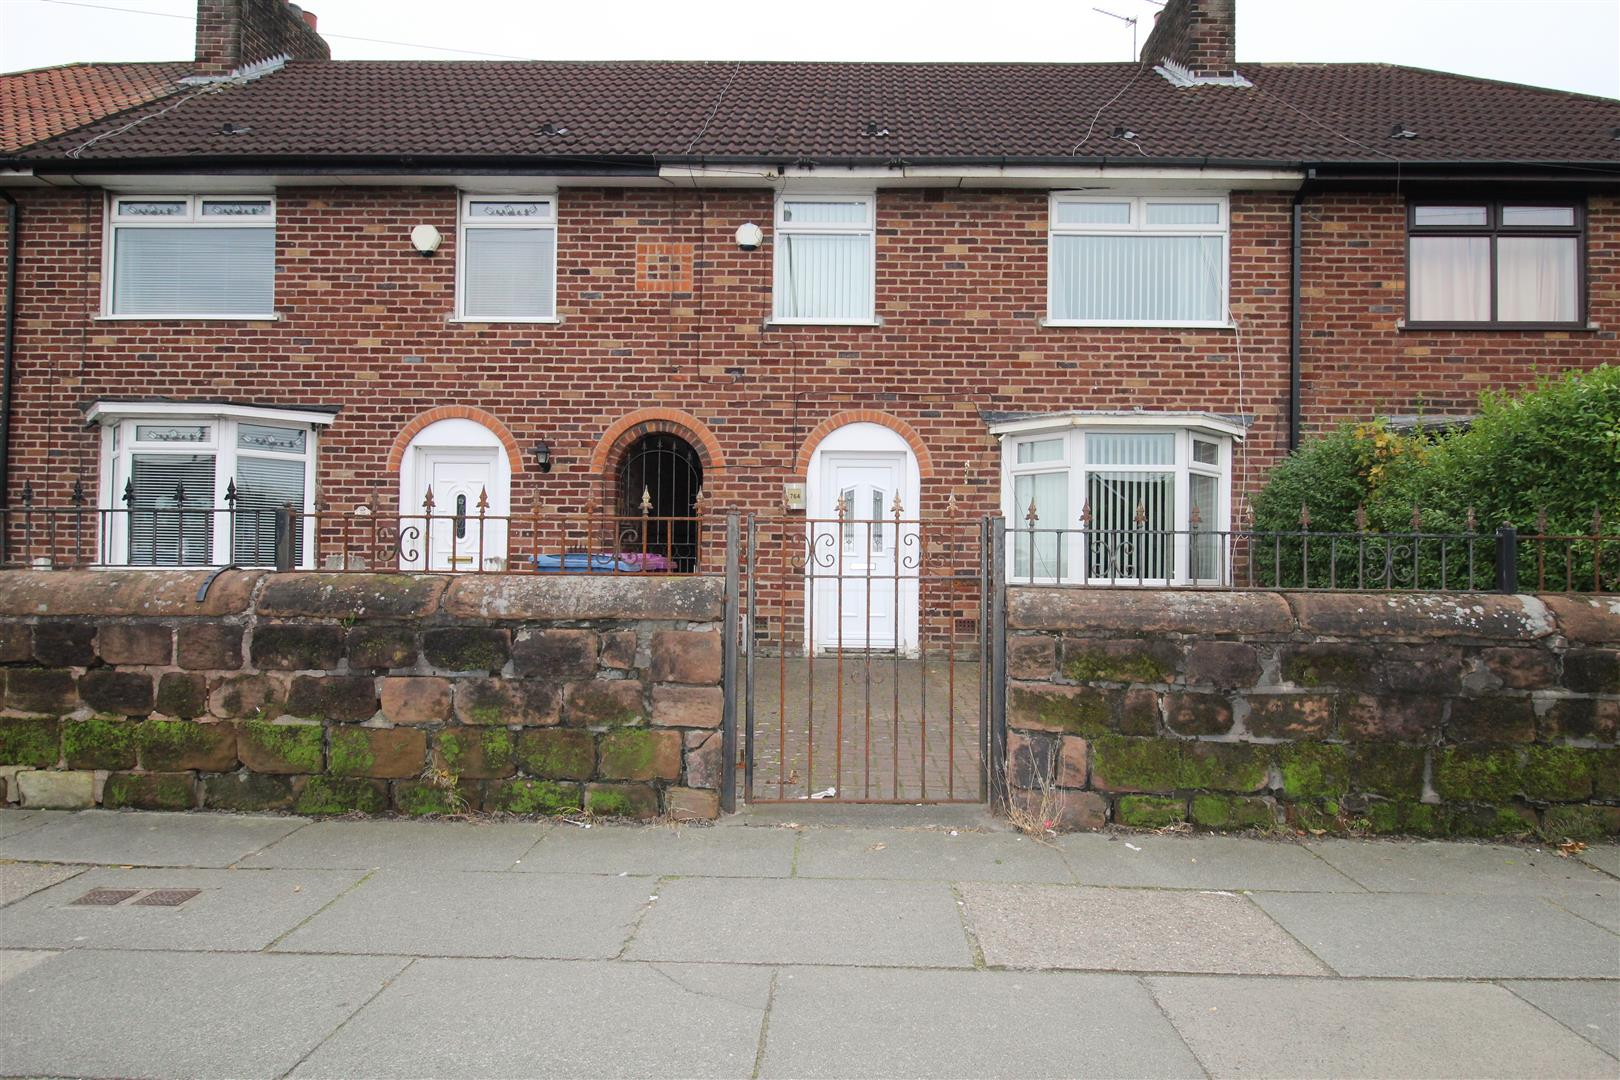 4 Bedrooms, House - Mid Terrace, Longmoor Lane, Fazakerley, Liverpool